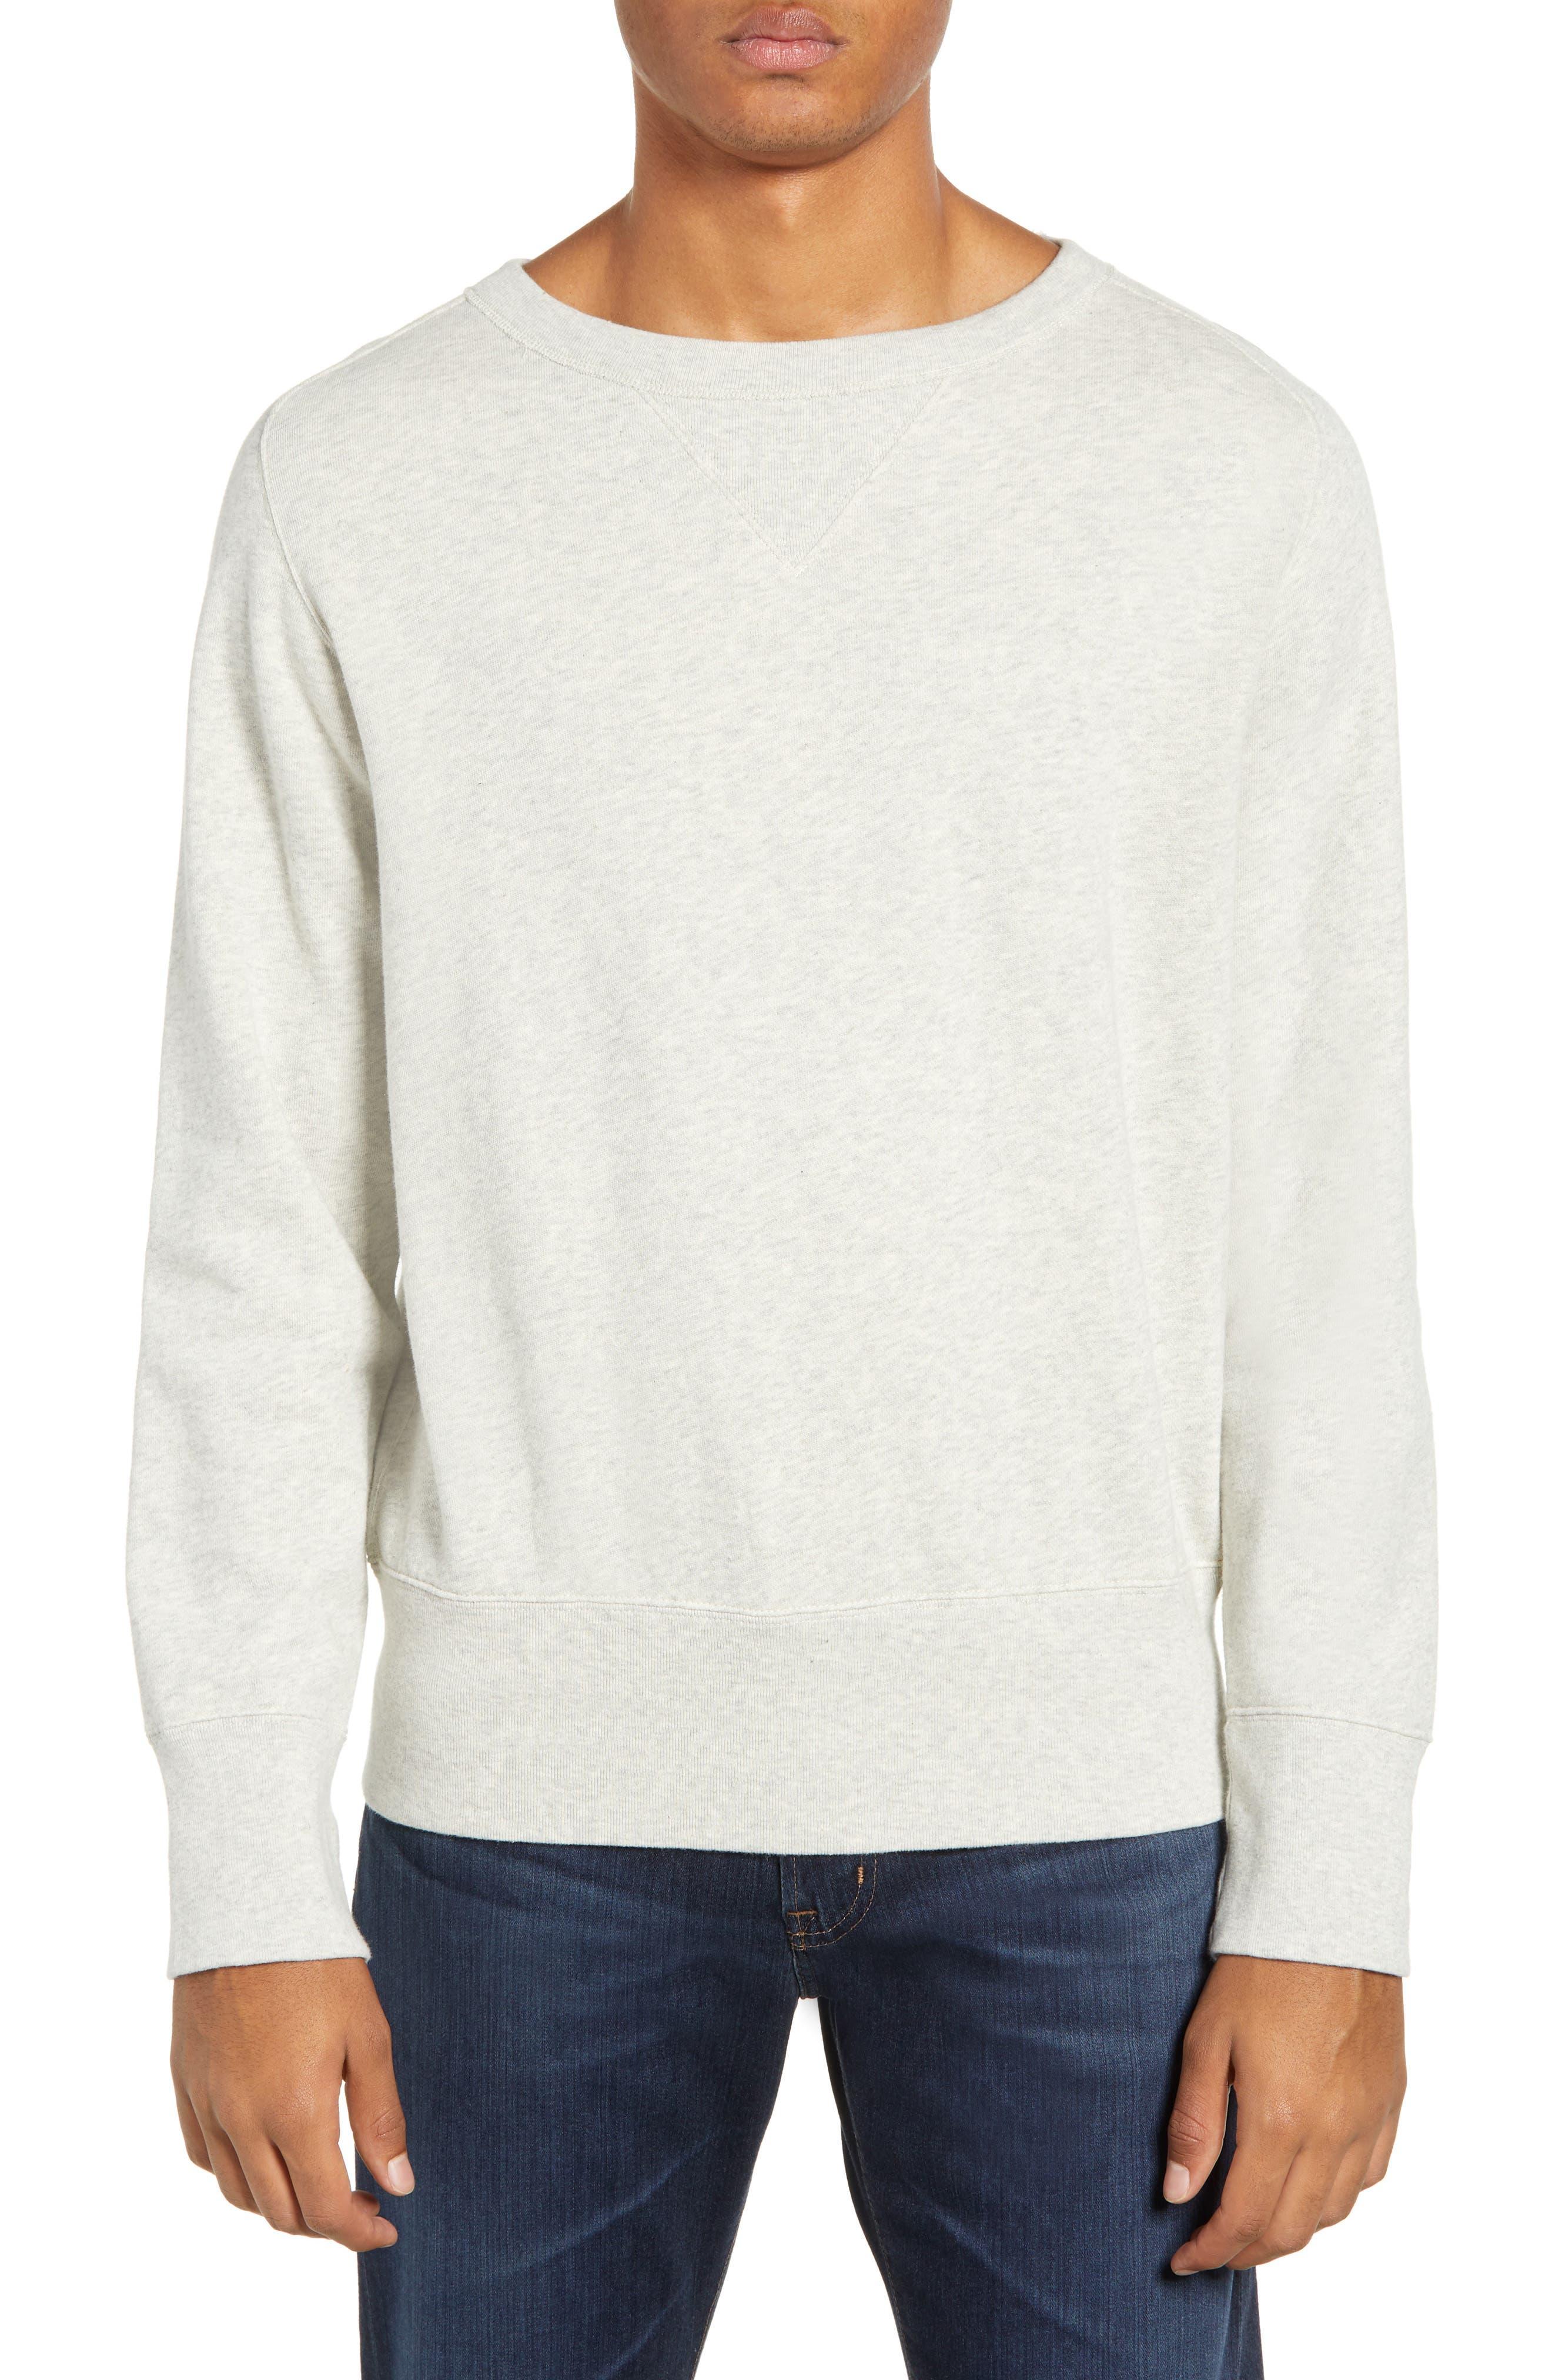 LEVI'S<SUP>®</SUP> VINTAGE CLOTHING 1930s Bay Meadows Sweatshirt, Main, color, OATMEAL